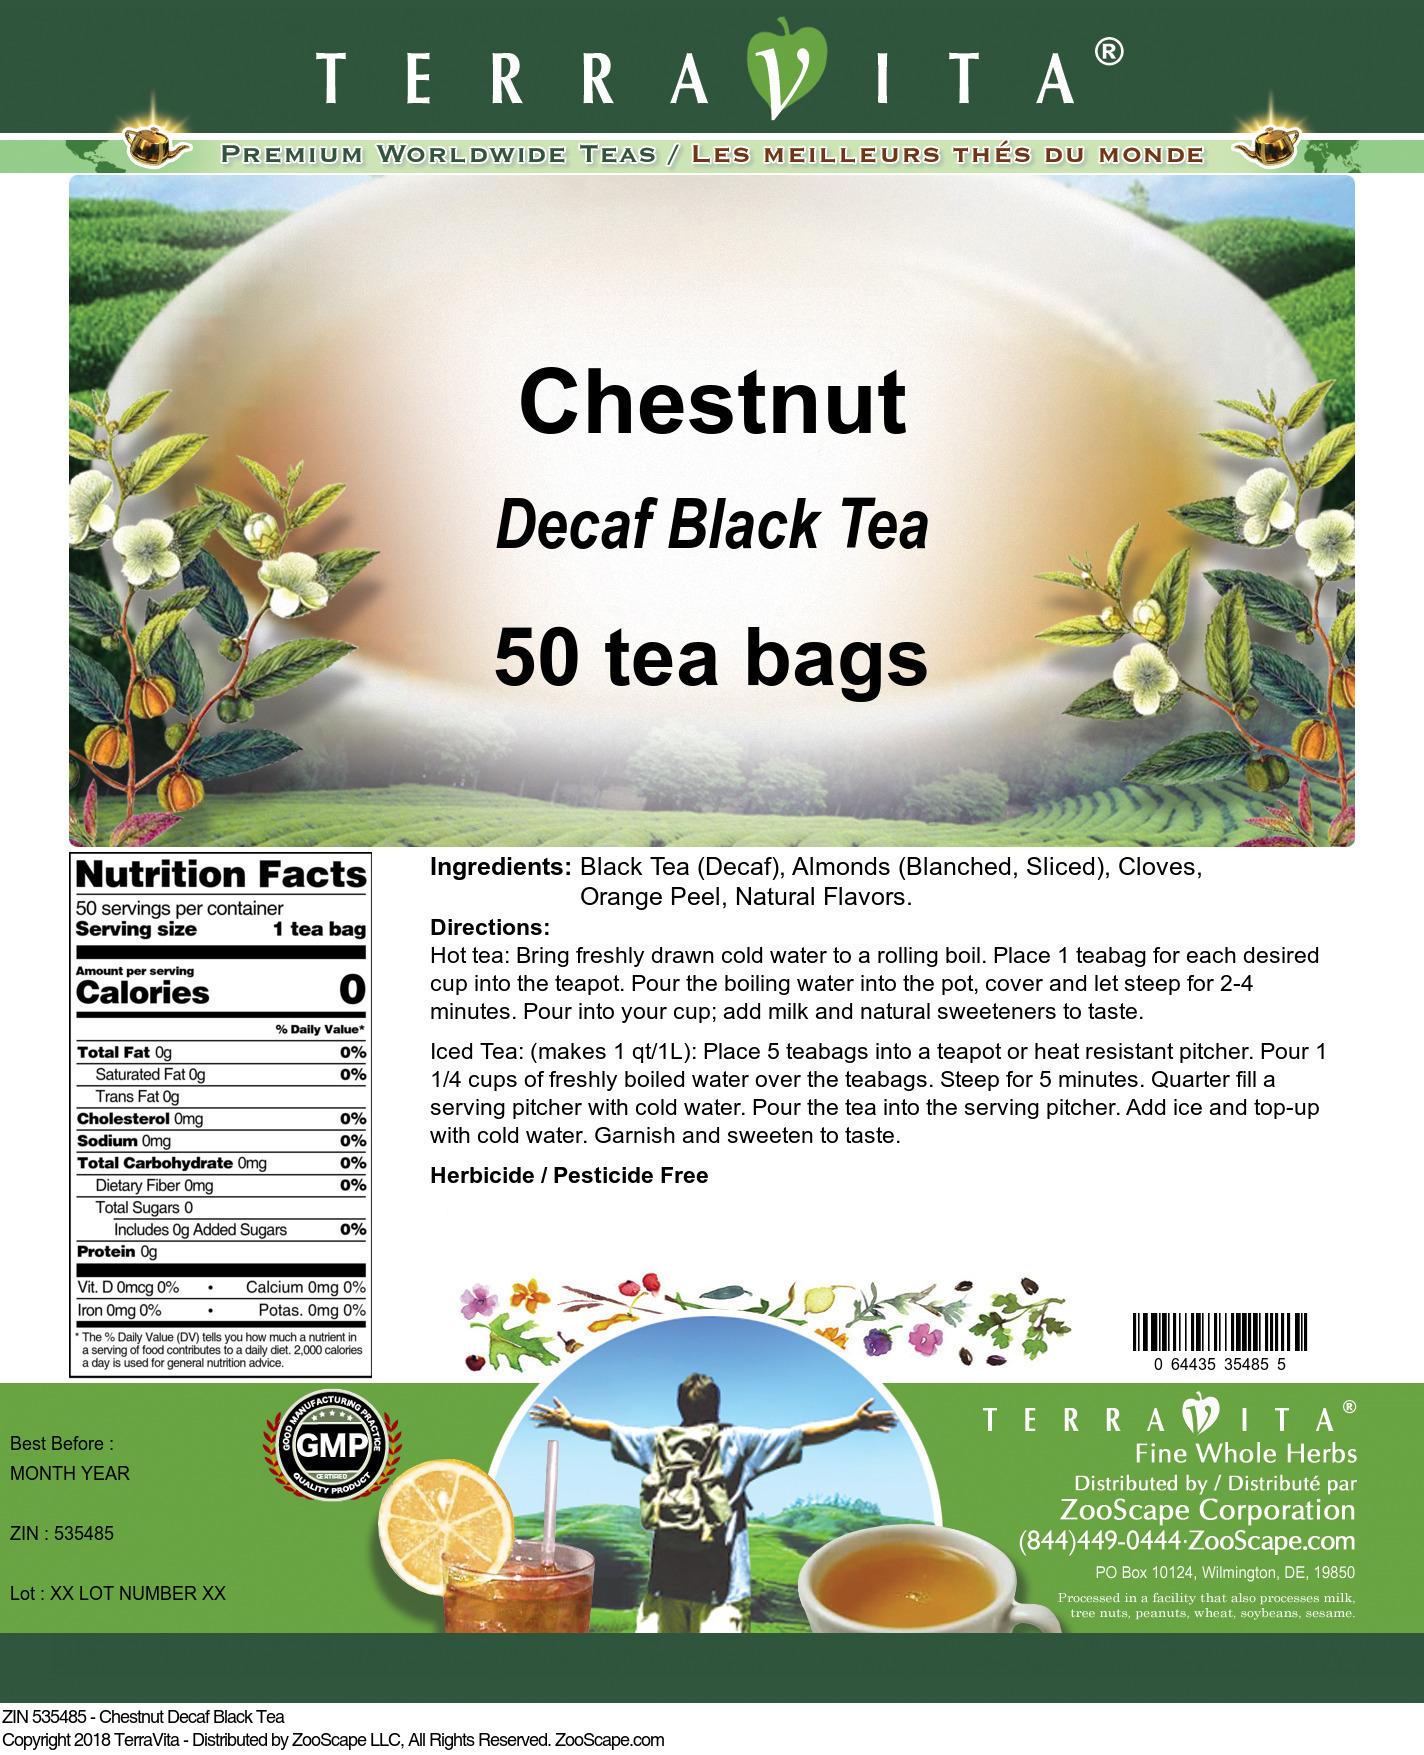 Chestnut Decaf Black Tea